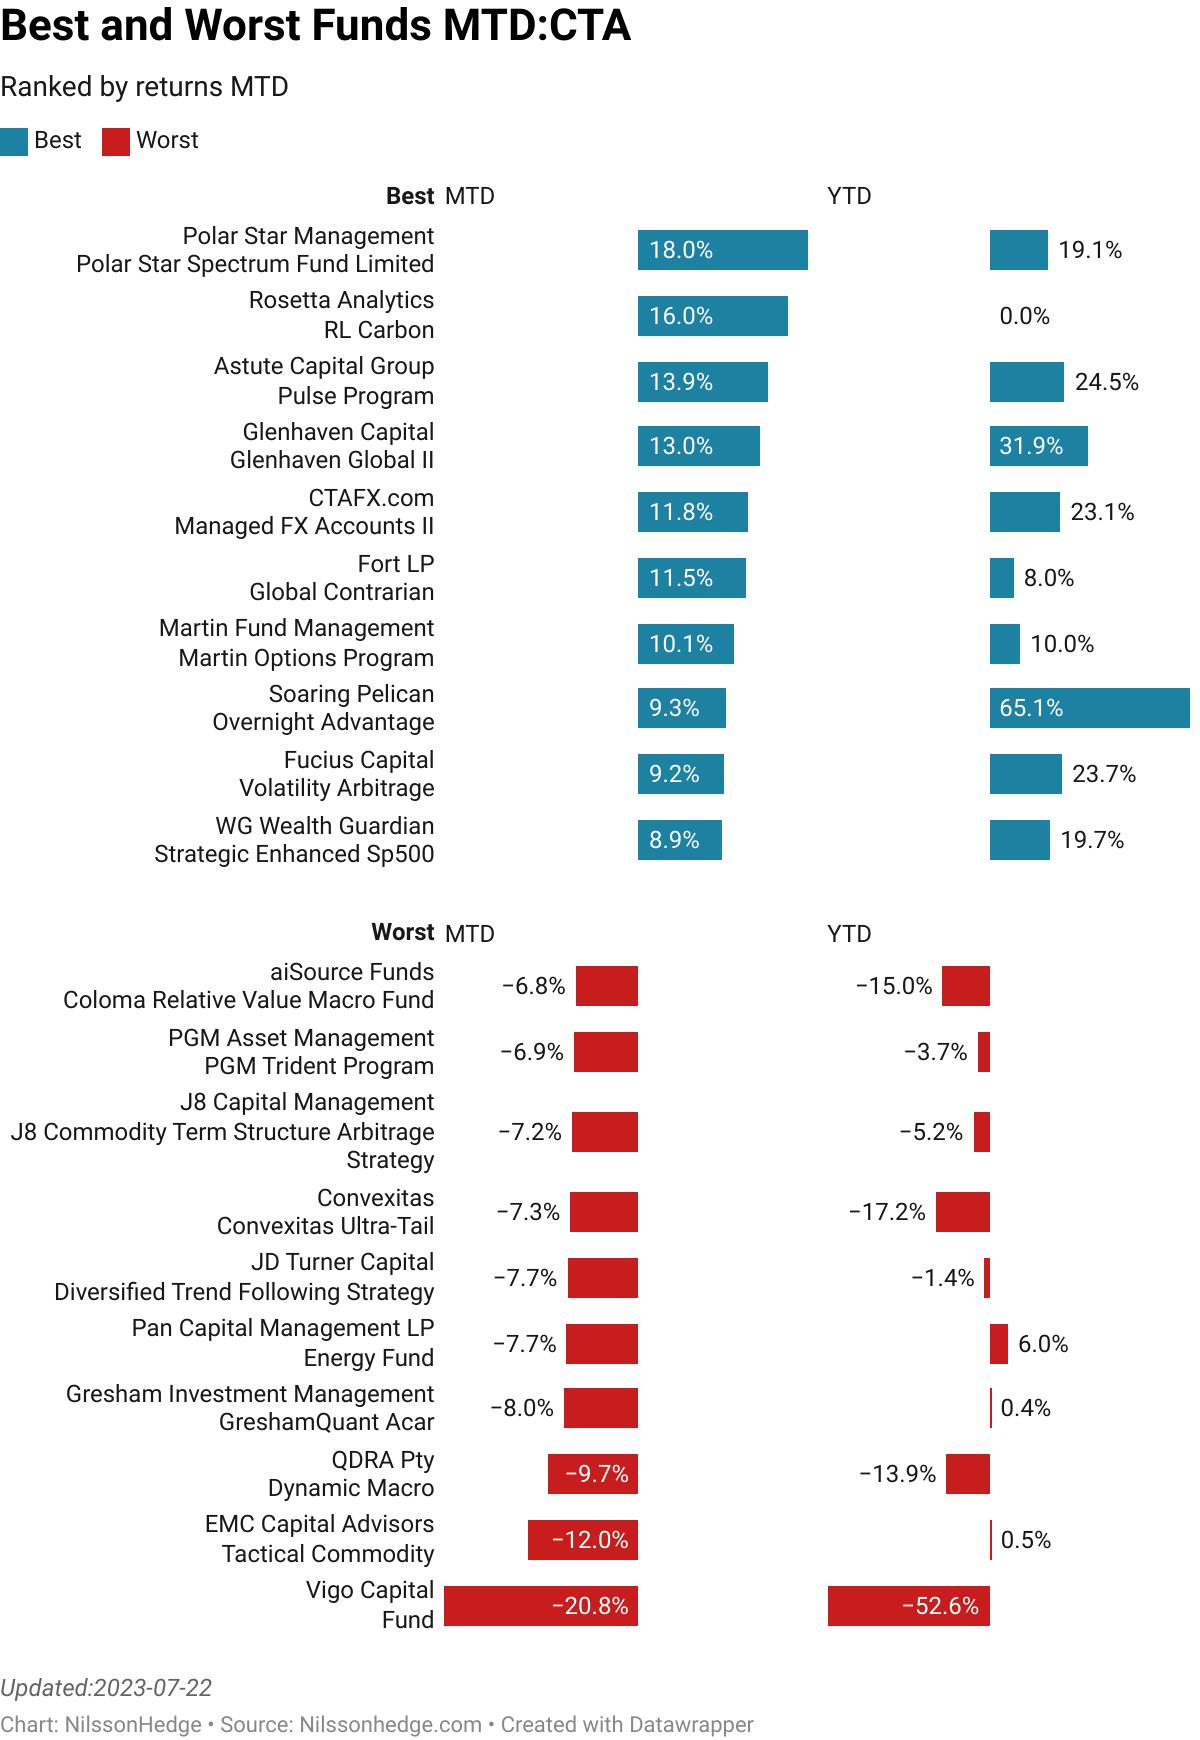 Bovell : Global Macro  :  16.86% [0.00]<br> Kopis Capital Management : Commodity Long Short  :  12.20% [0.71]<br> Alpha Kairos Asset Management : Acclivity Sys  :  8.97% [0.00]<br> WG Wealth Guardian : QT Program  :  8.81% [1.50]<br> World Cup Advisor : Jorg Diemand Volatility Patterns  :  7.85% [0.05]<br> Soaring Pelican : Overnight Advantage  :  6.13% [0.65]<br> RCMA Capital : Merchant Commodity Fund  :  5.70% [237.00]<br> Sigma Advanced Capital Management : Carbon Neutral Alpha Program  :  5.43% [2.20]<br> Alpha Kairos Asset Management : Acclivity Prop  :  5.41% [0.00]<br> THS Capital Management : Diversified Futures Accelerated Growth  :  5.34% [1.45]<br> Eclipse Capital Management : Tactical Alpha Program  :  -5.45% [146.80]<br> Glenhaven Capital : Glenhaven Global II  :  -5.64% [4.60]<br> Hornsby & Company : Ryan Alderson Intermediate Swing  :  -6.17% [0.03]<br> World Cup Advisor : Larry Williams Mini S&P  :  -6.20% [0.04]<br> Astute Capital Group : Pulse Program  :  -6.33% [6.07]<br> Superfund Capital Management : Green Silver SICAV  :  -7.40% [124.00]<br> World Cup Advisor : Petra Ilona Zacek Eclipse  :  -10.71% [0.01]<br> Worldwide Capital Strategies : Profit Quest Macro World  :  -13.19% [5.30]<br> World Cup Advisor : Paige Williams Day Trader  :  -18.26% [0.01]<br> World Cup Advisor : Sebastian Baumgaertel Target Zones  :  -32.95% [0.01]<br> >